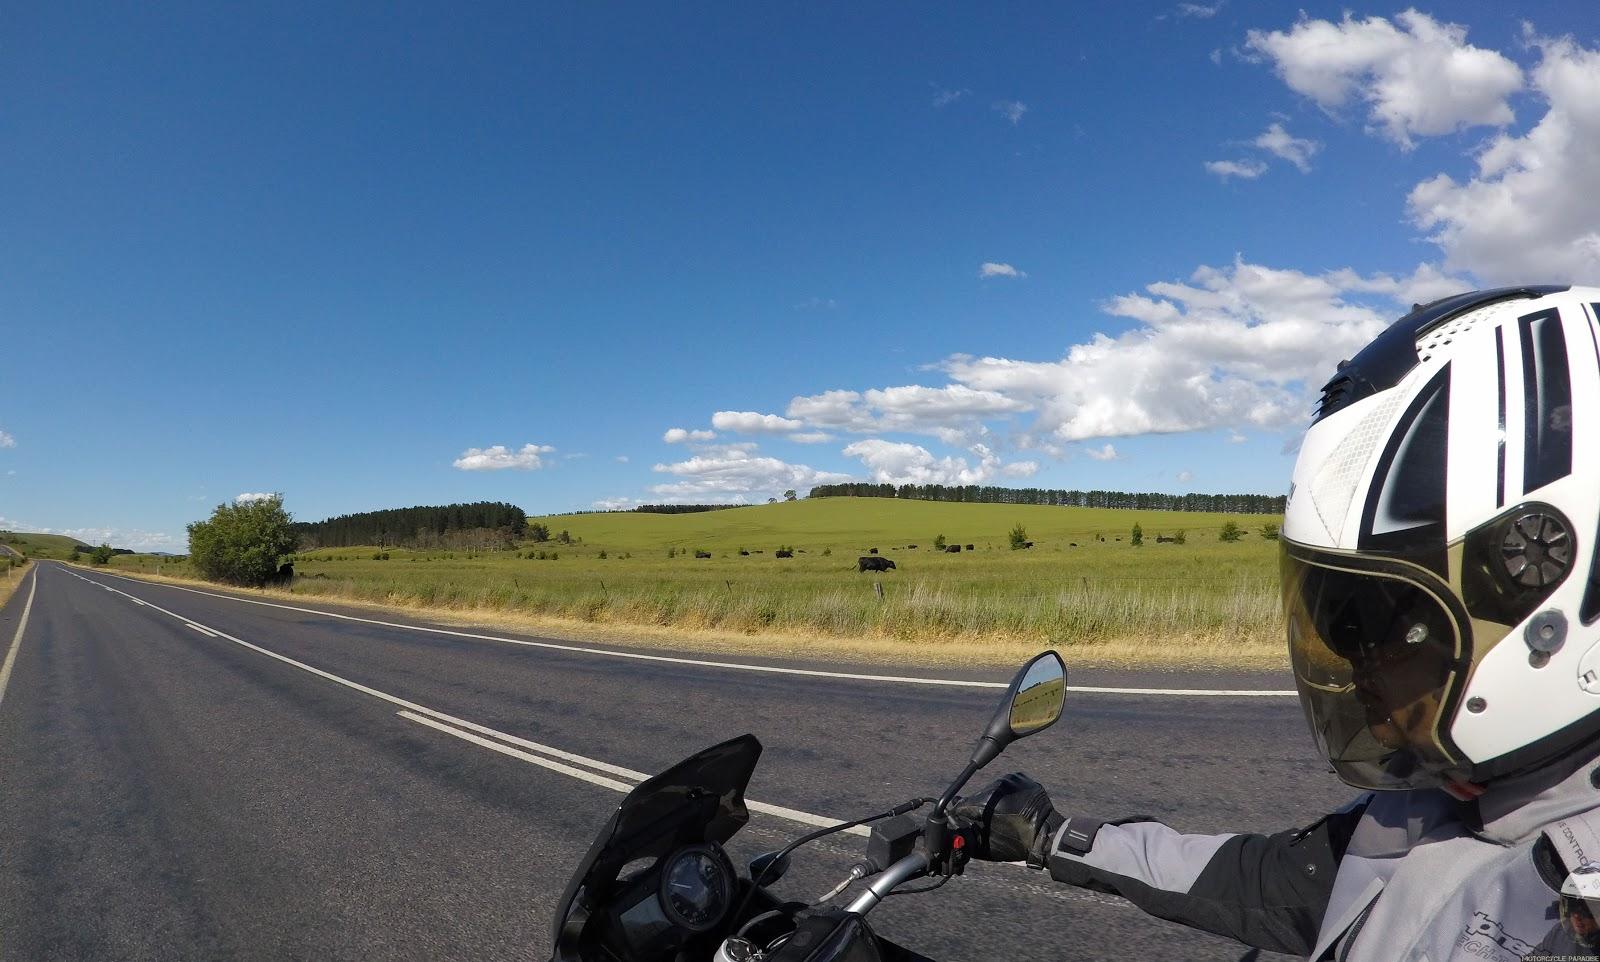 Australia's best motorcycle roads  Clyde Mountain